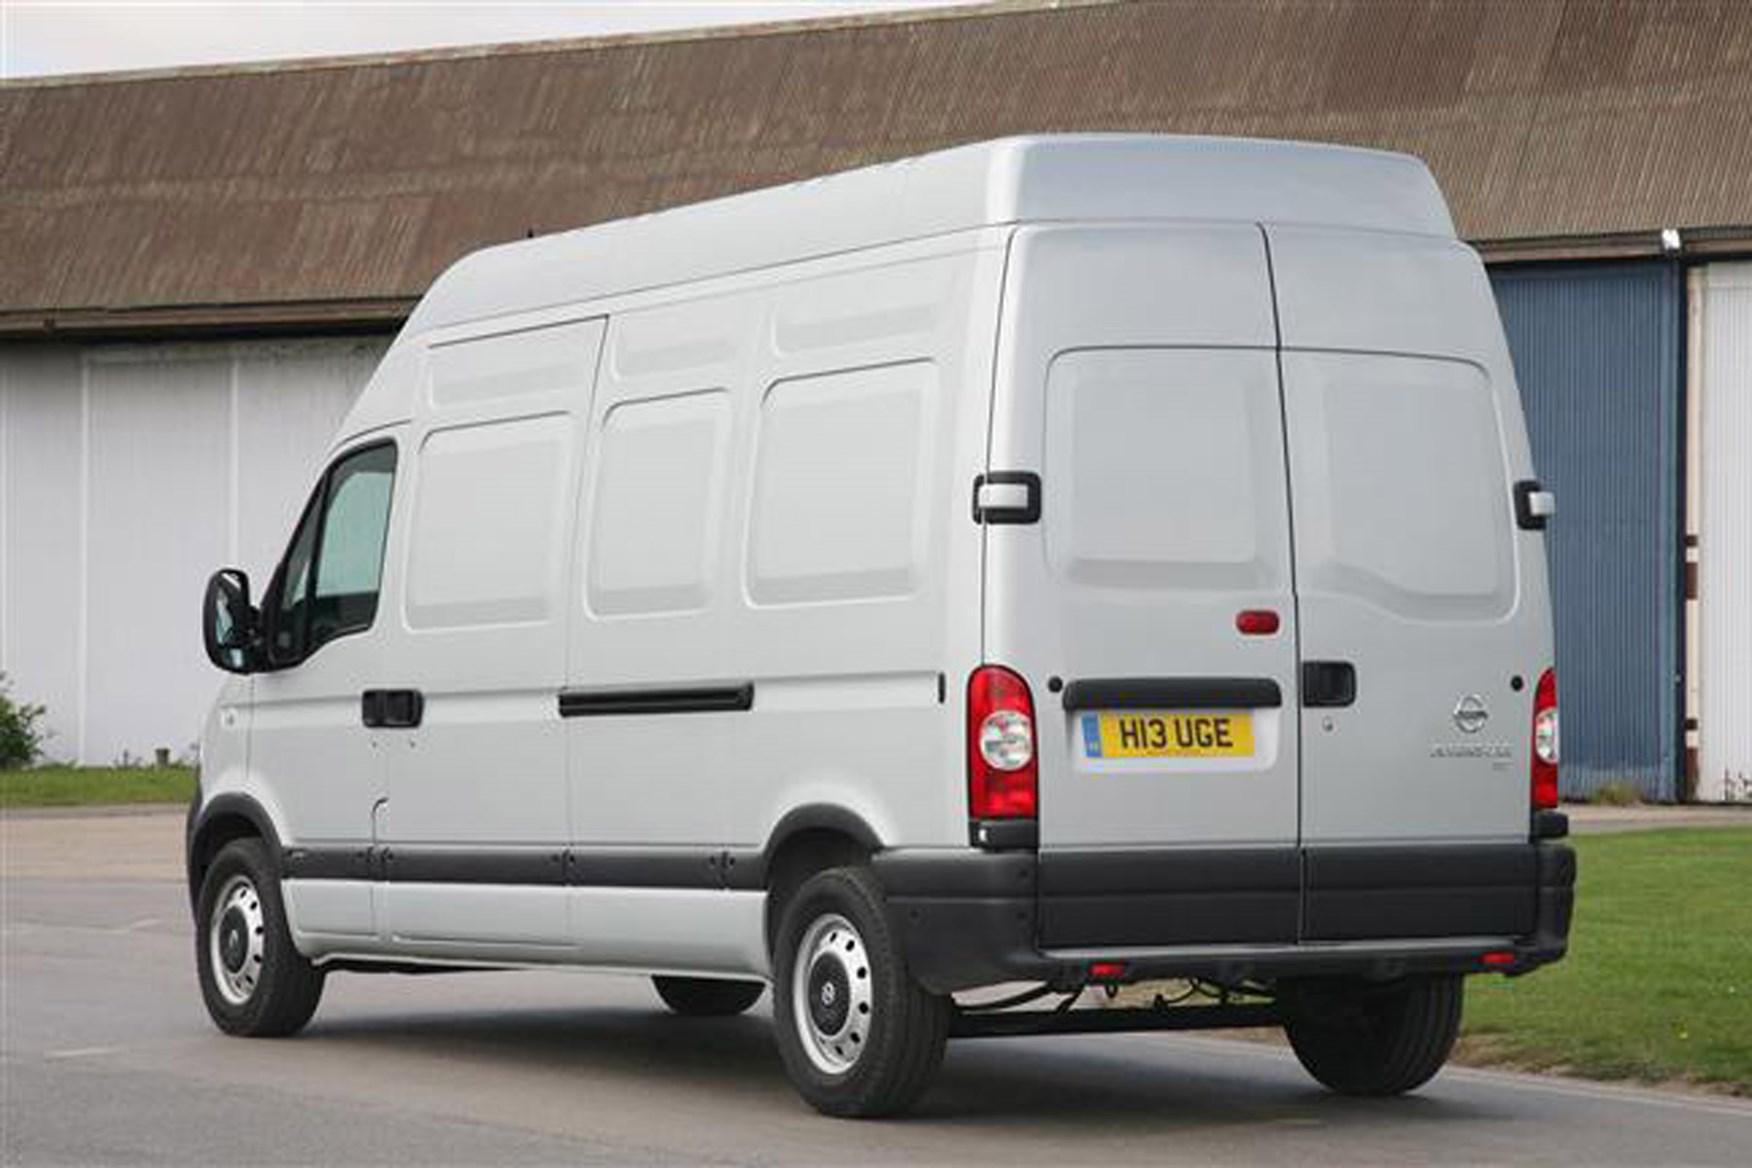 Nissan Interstar 2003-2011 review on Parkers Vans - rear exterior